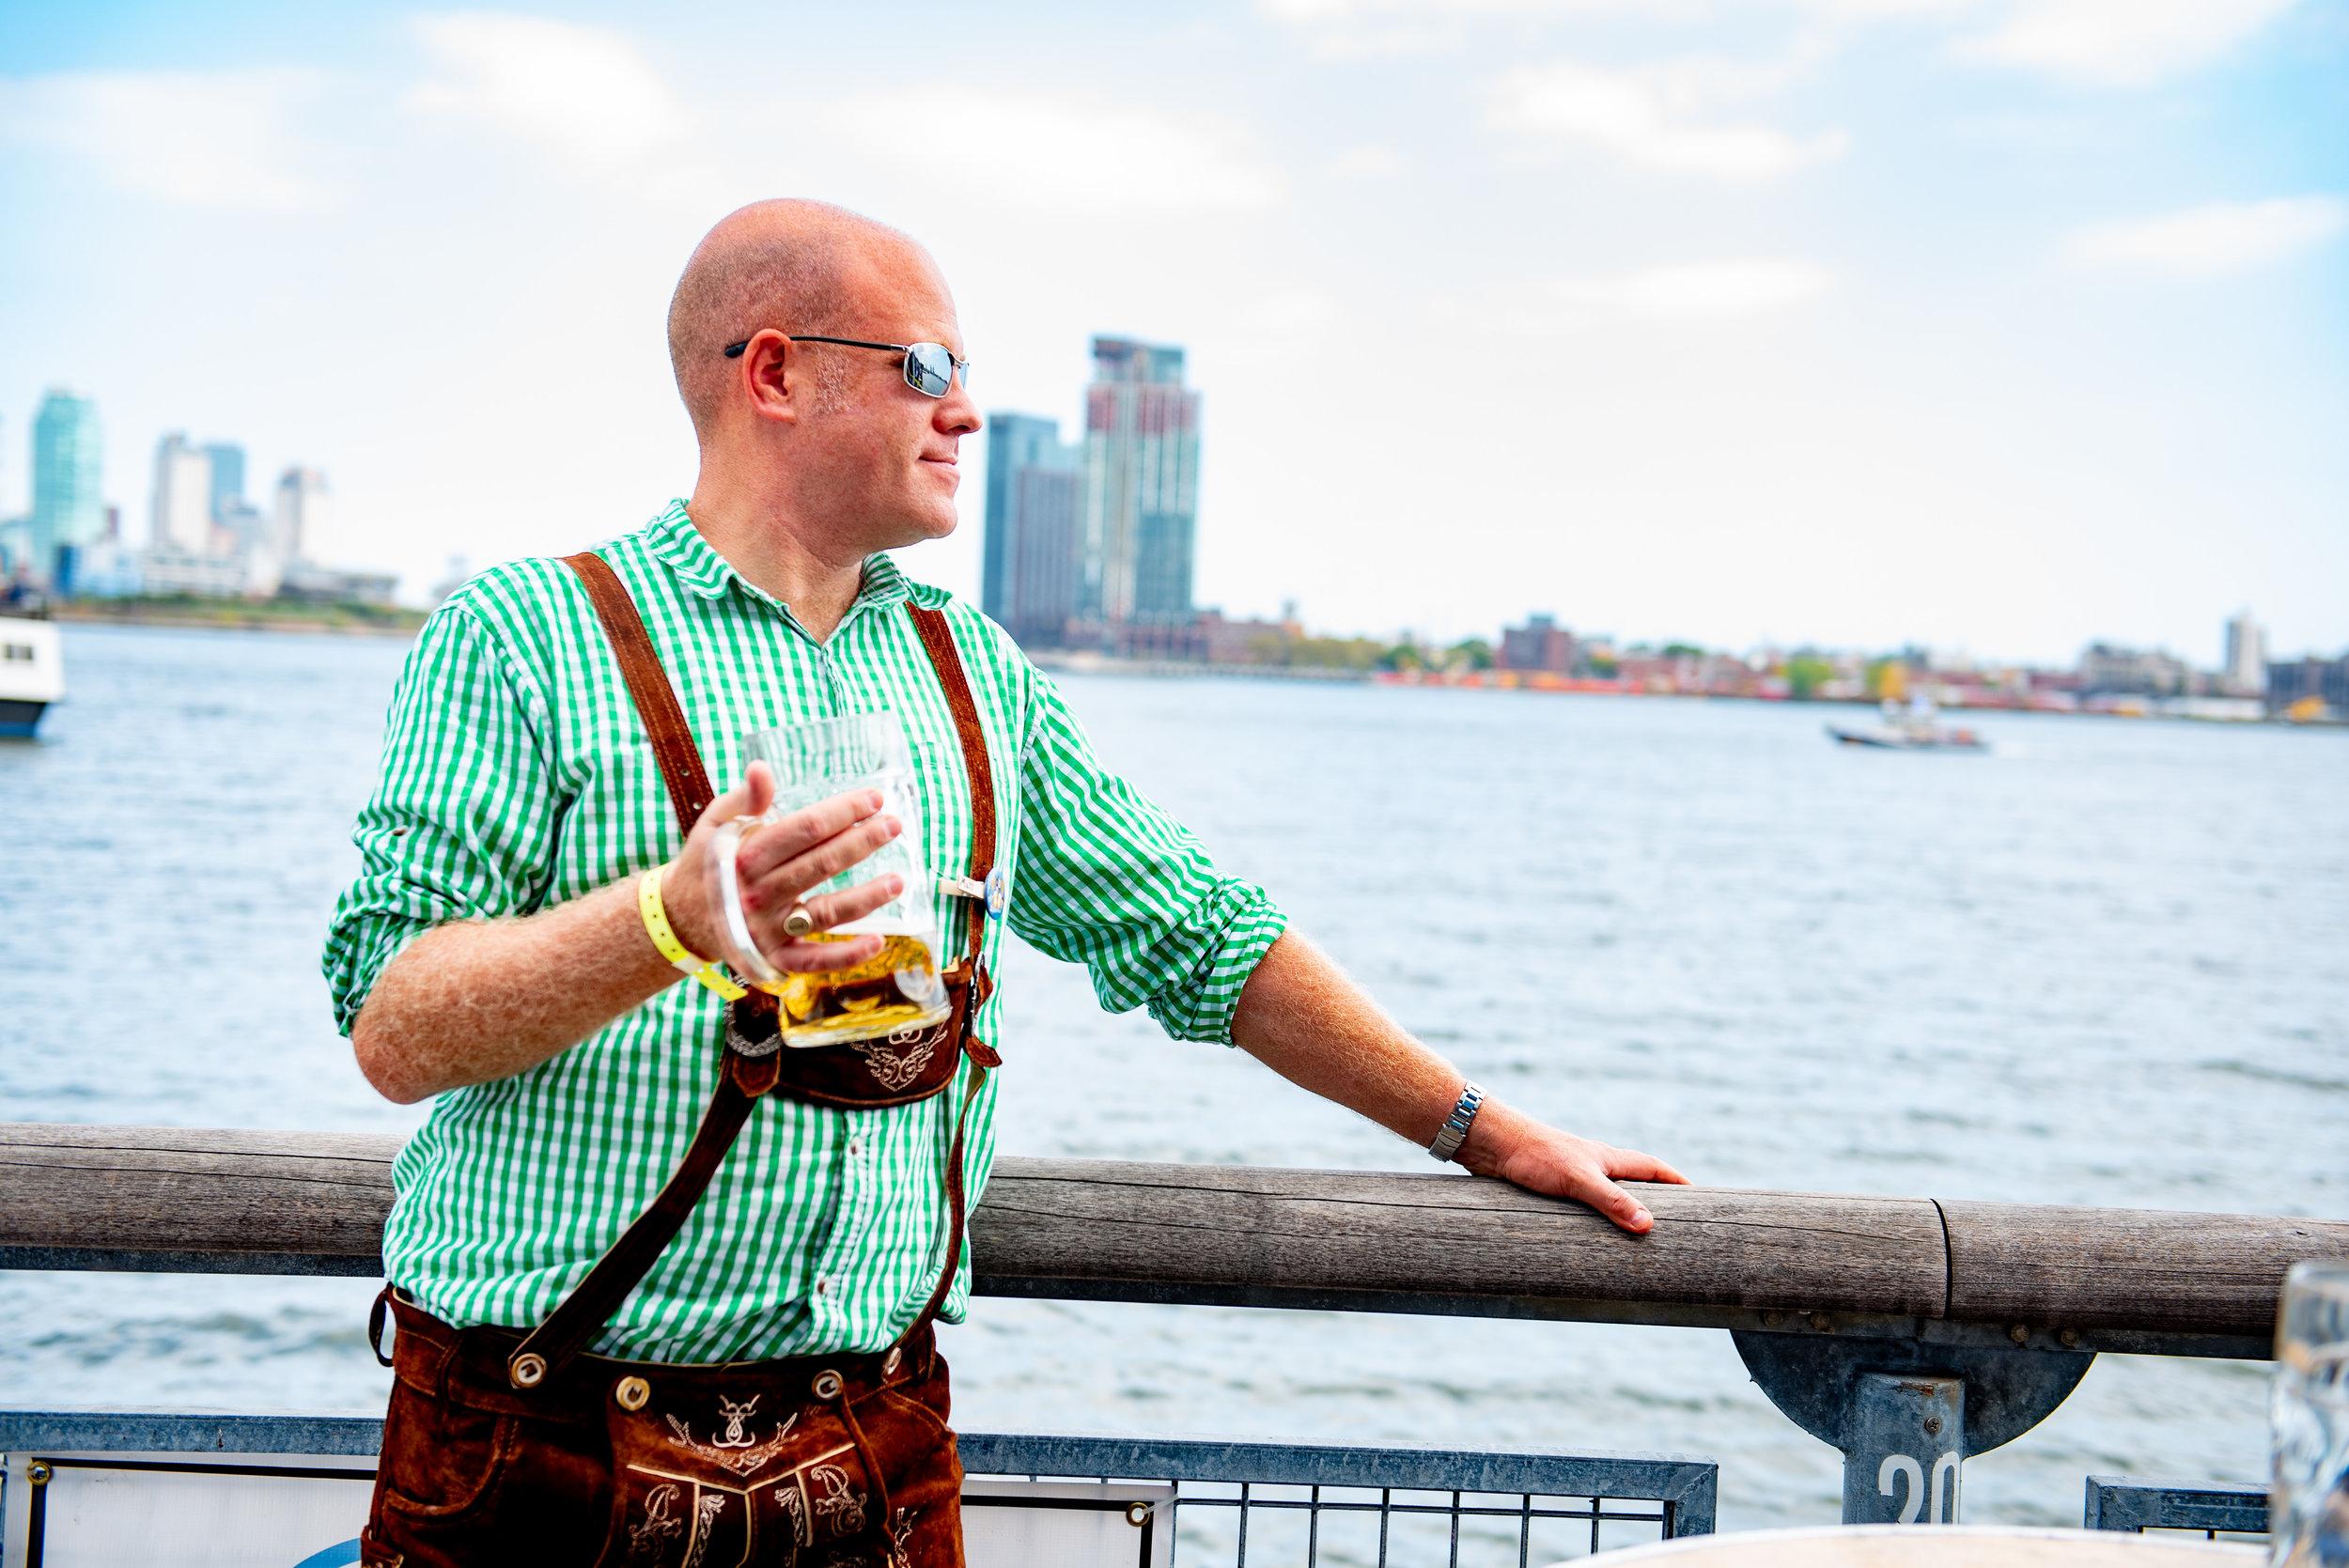 jonathan-mcphail-photography-brooklyn-new-york-nyc-event-events-photographer-4124.jpg